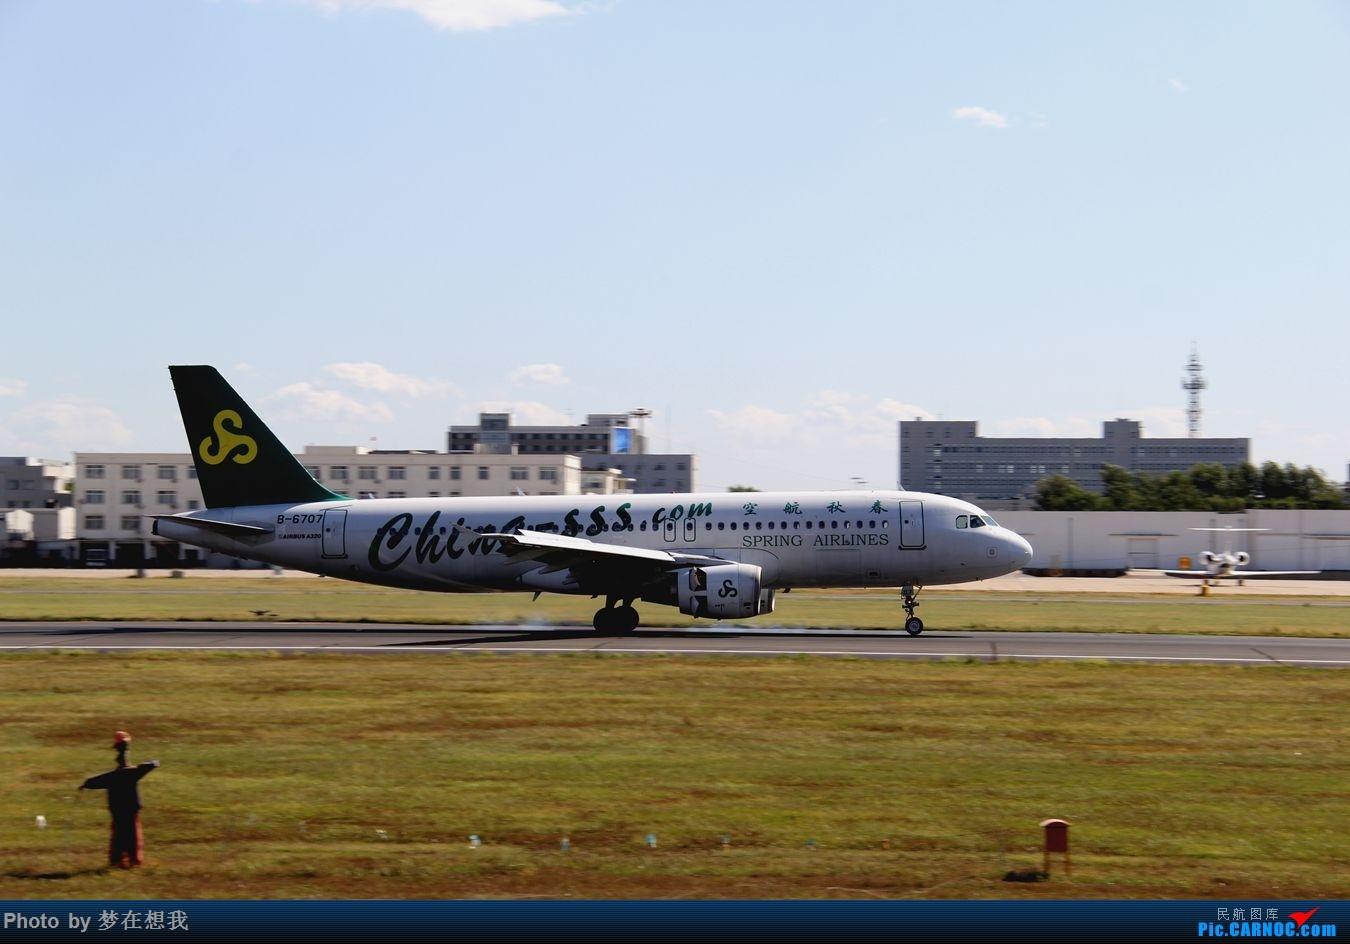 Re:[原创]十月二号高中党坐动车从丹东到沈阳拍机SHE AIRBUS A320-200 B-6707 中国沈阳桃仙国际机场